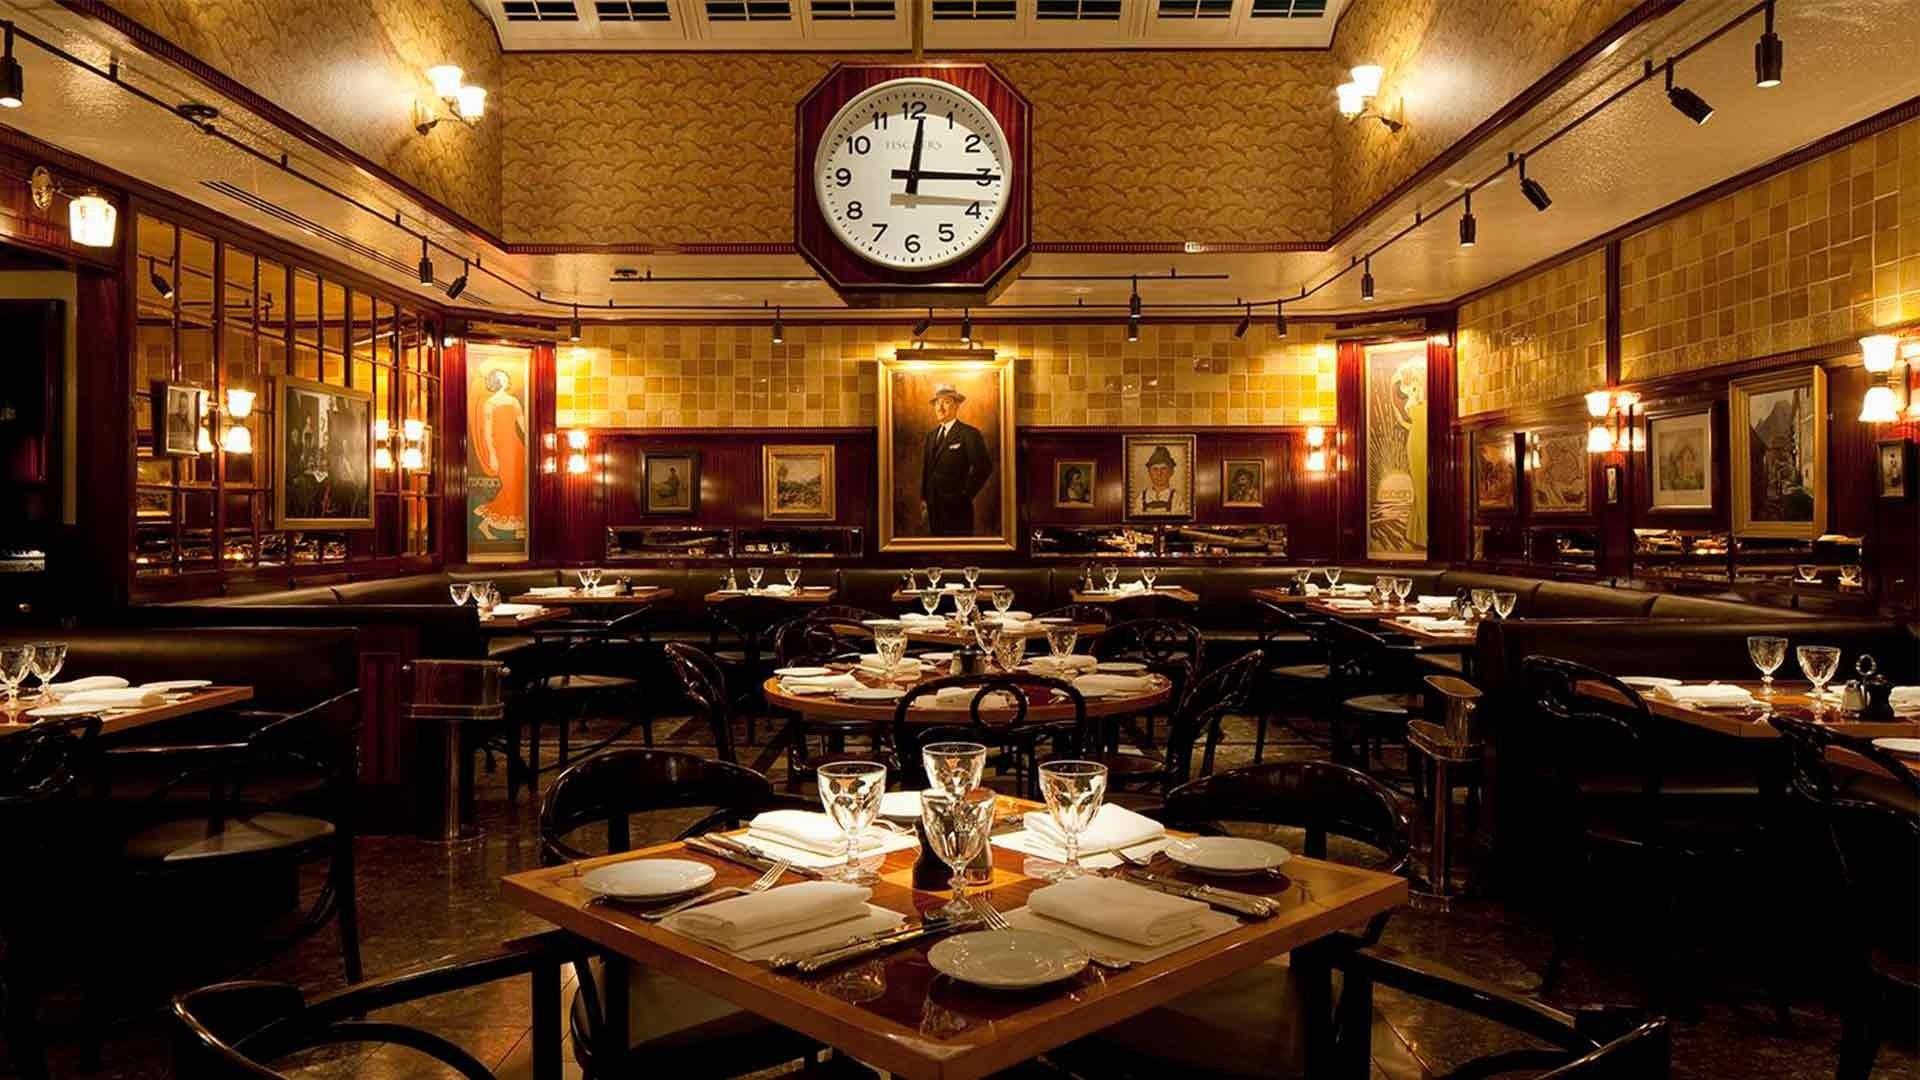 Fischers Marylebone Nulty Lighting Design Consultants : elegant lighting ambience tiles dining room atmosphere nulty banner 1920x1080 from www.nultylighting.co.uk size 1920 x 1080 jpeg 255kB